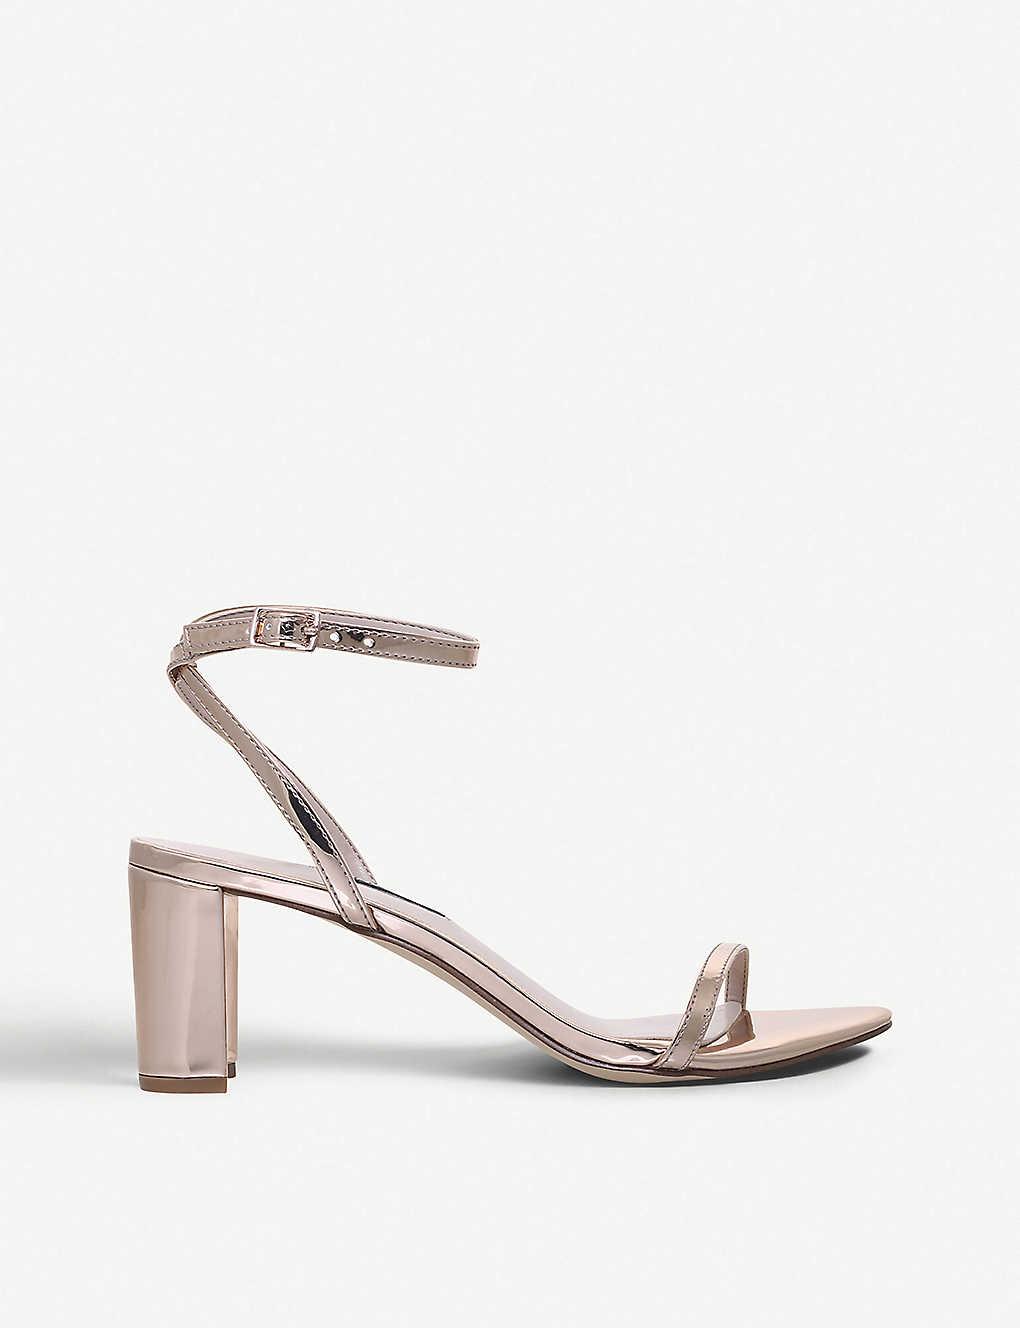 24022d672f1 NINE WEST - Provein metallic two-part heeled sandals